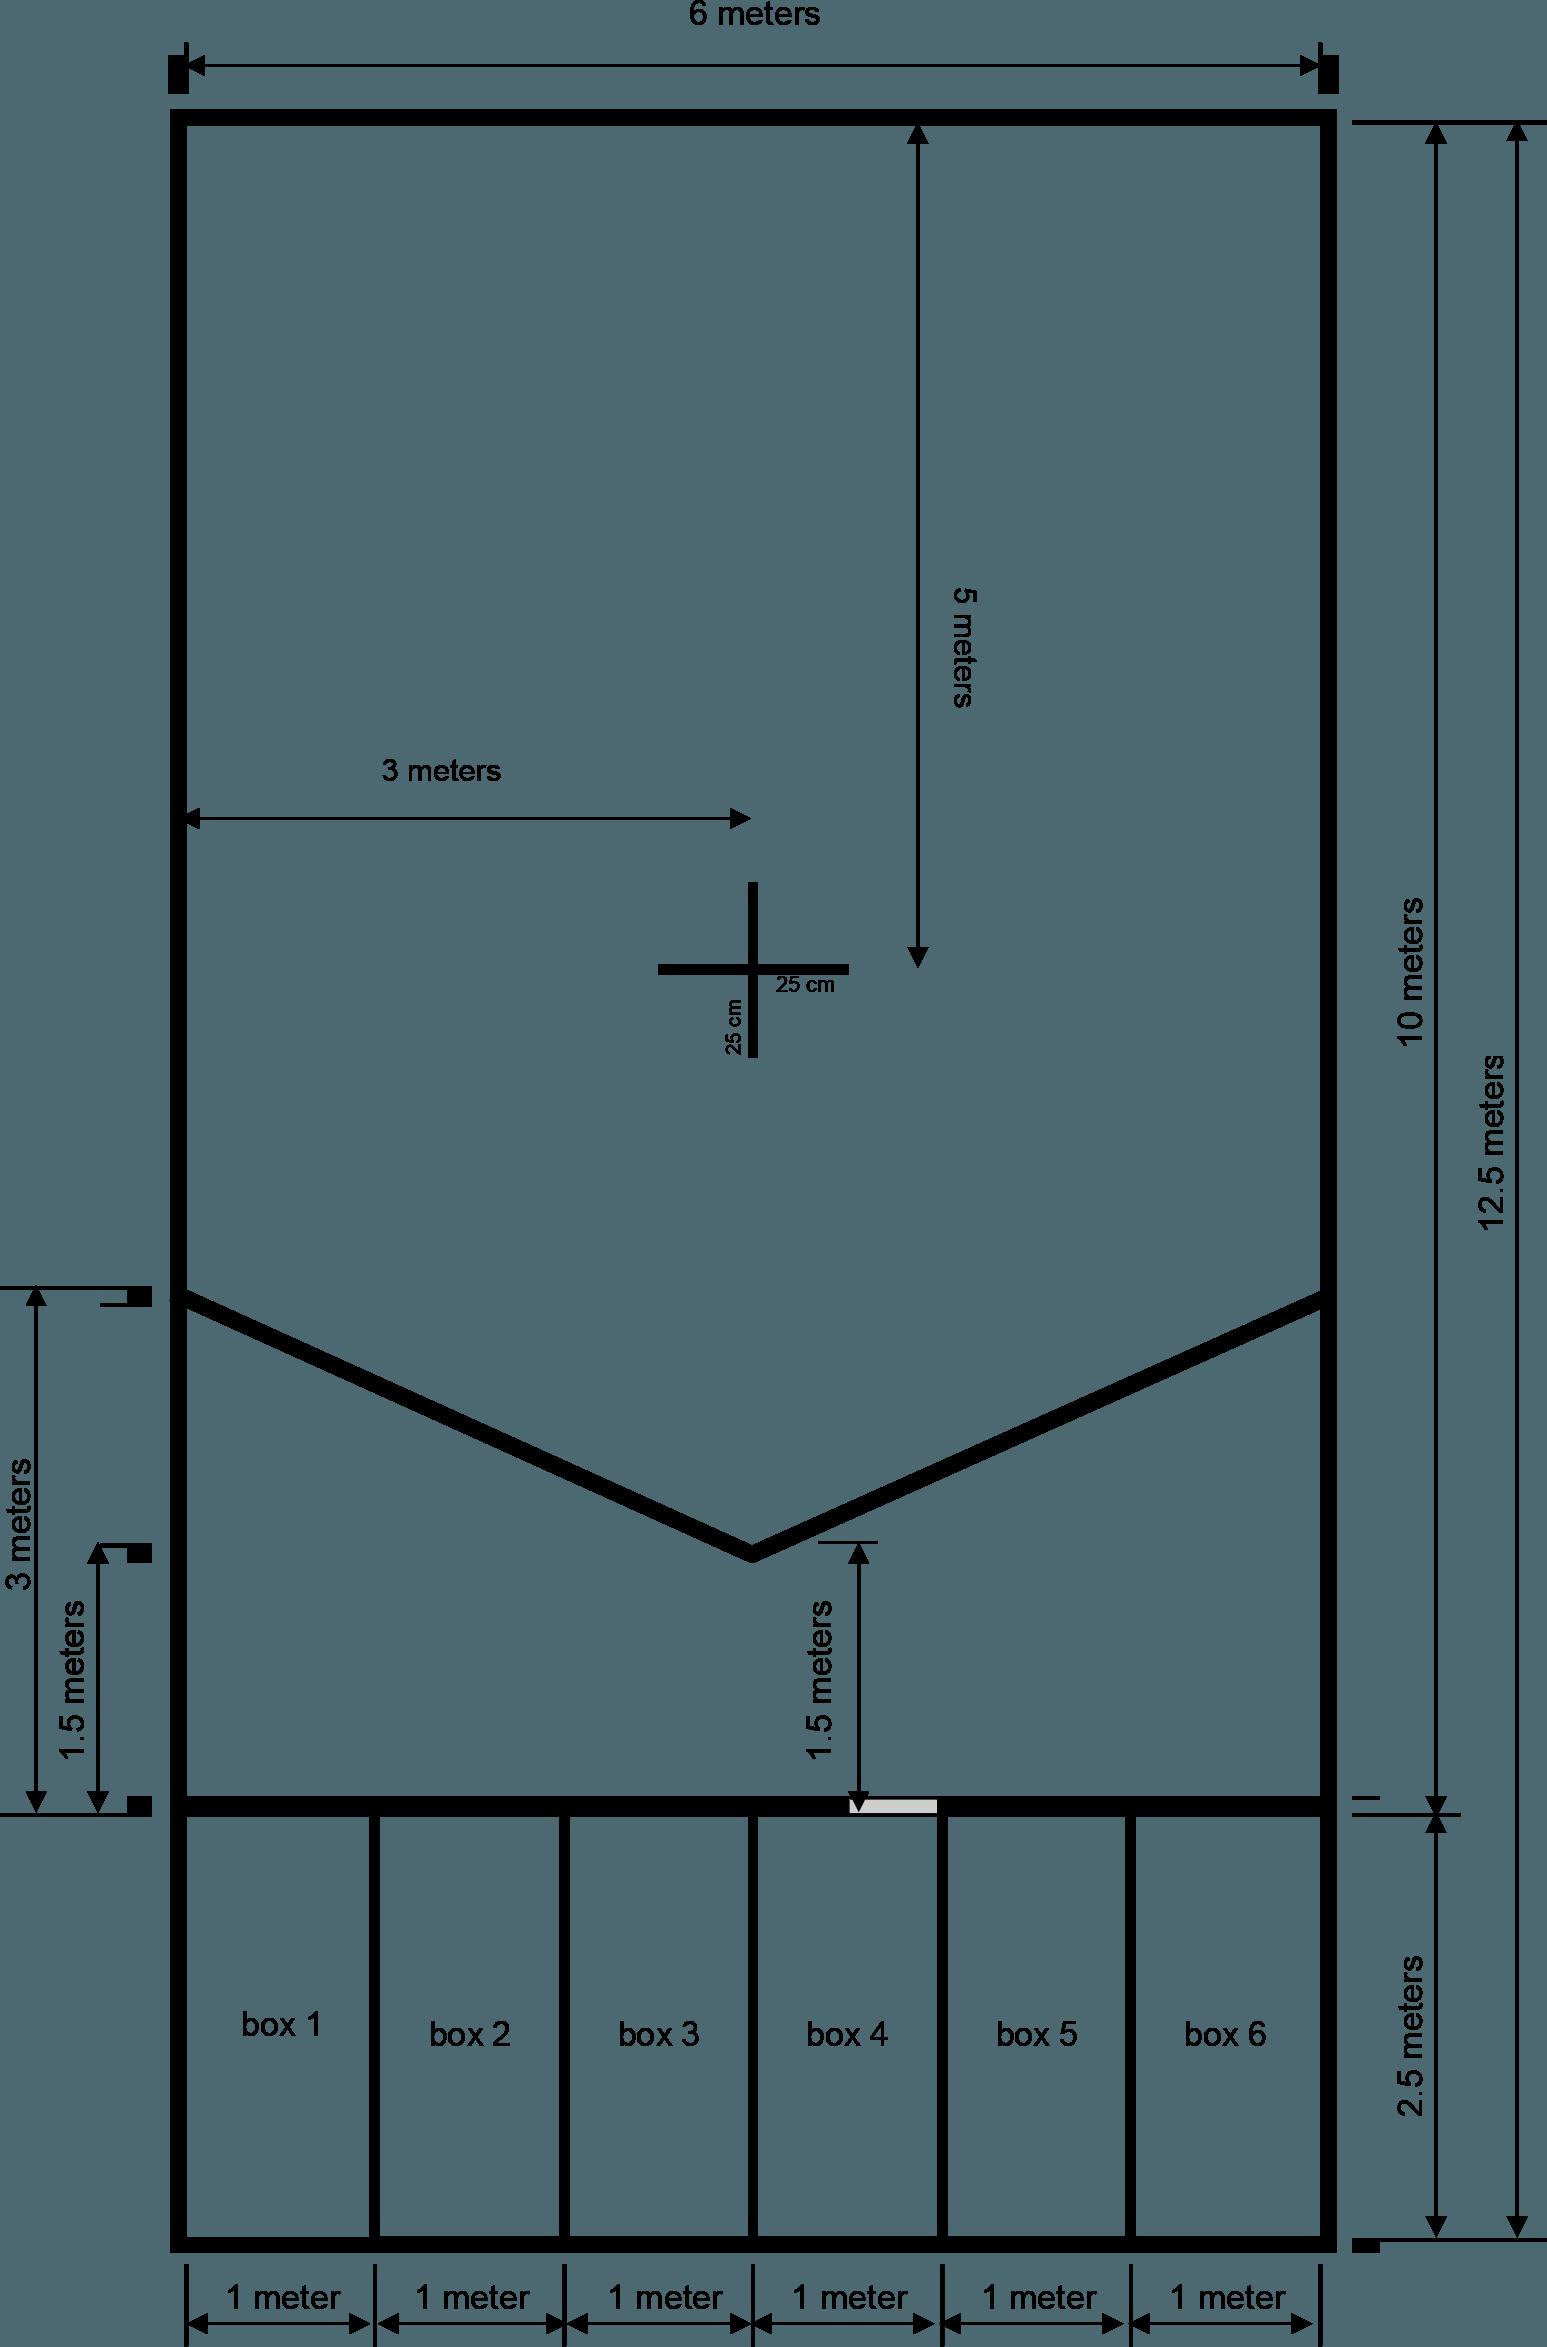 boccia-court-layout